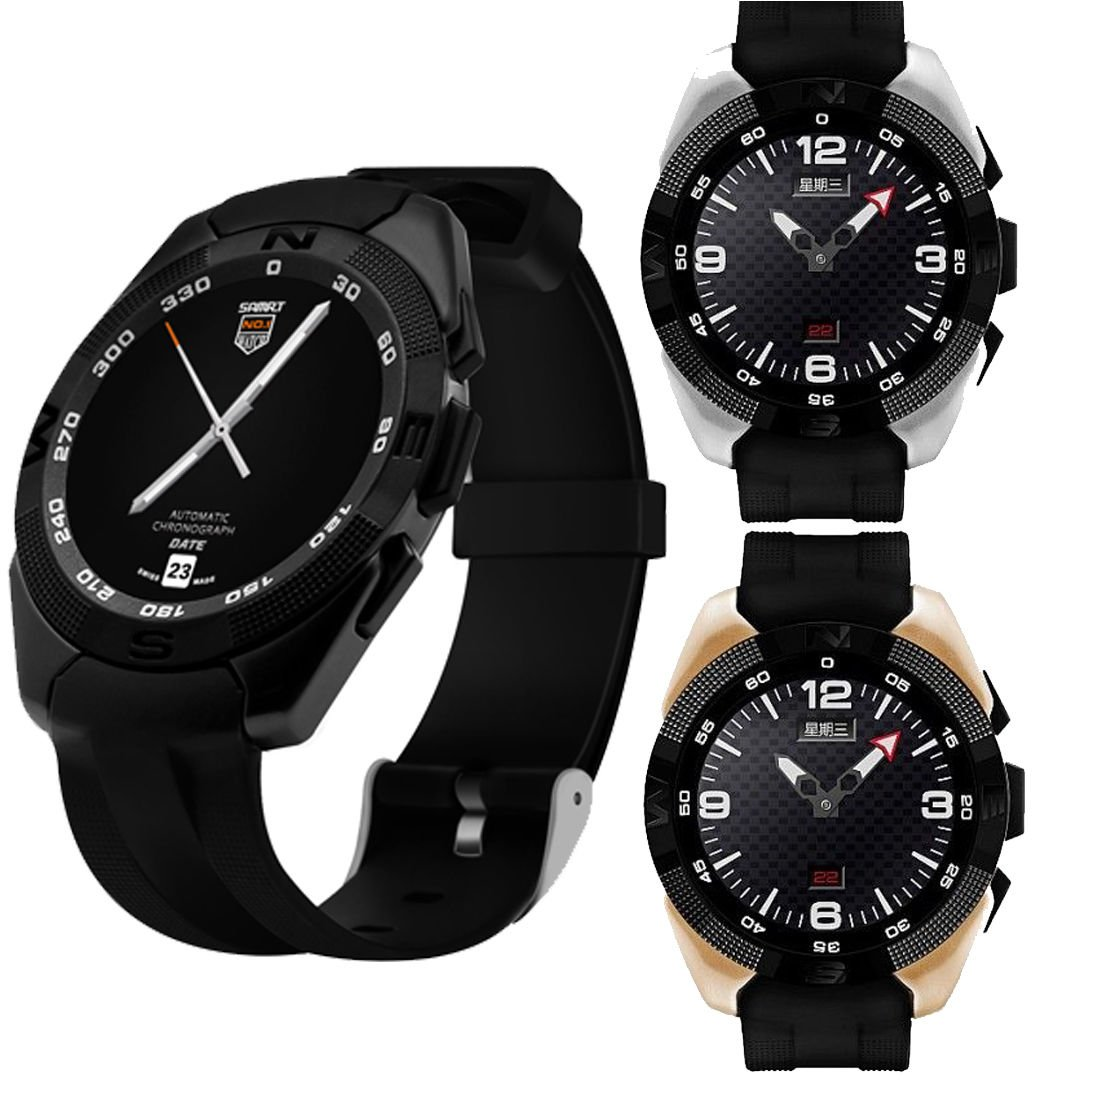 Amazon.com: G5 Smart Watch Bluetooth Fitness Tracker Sport ...